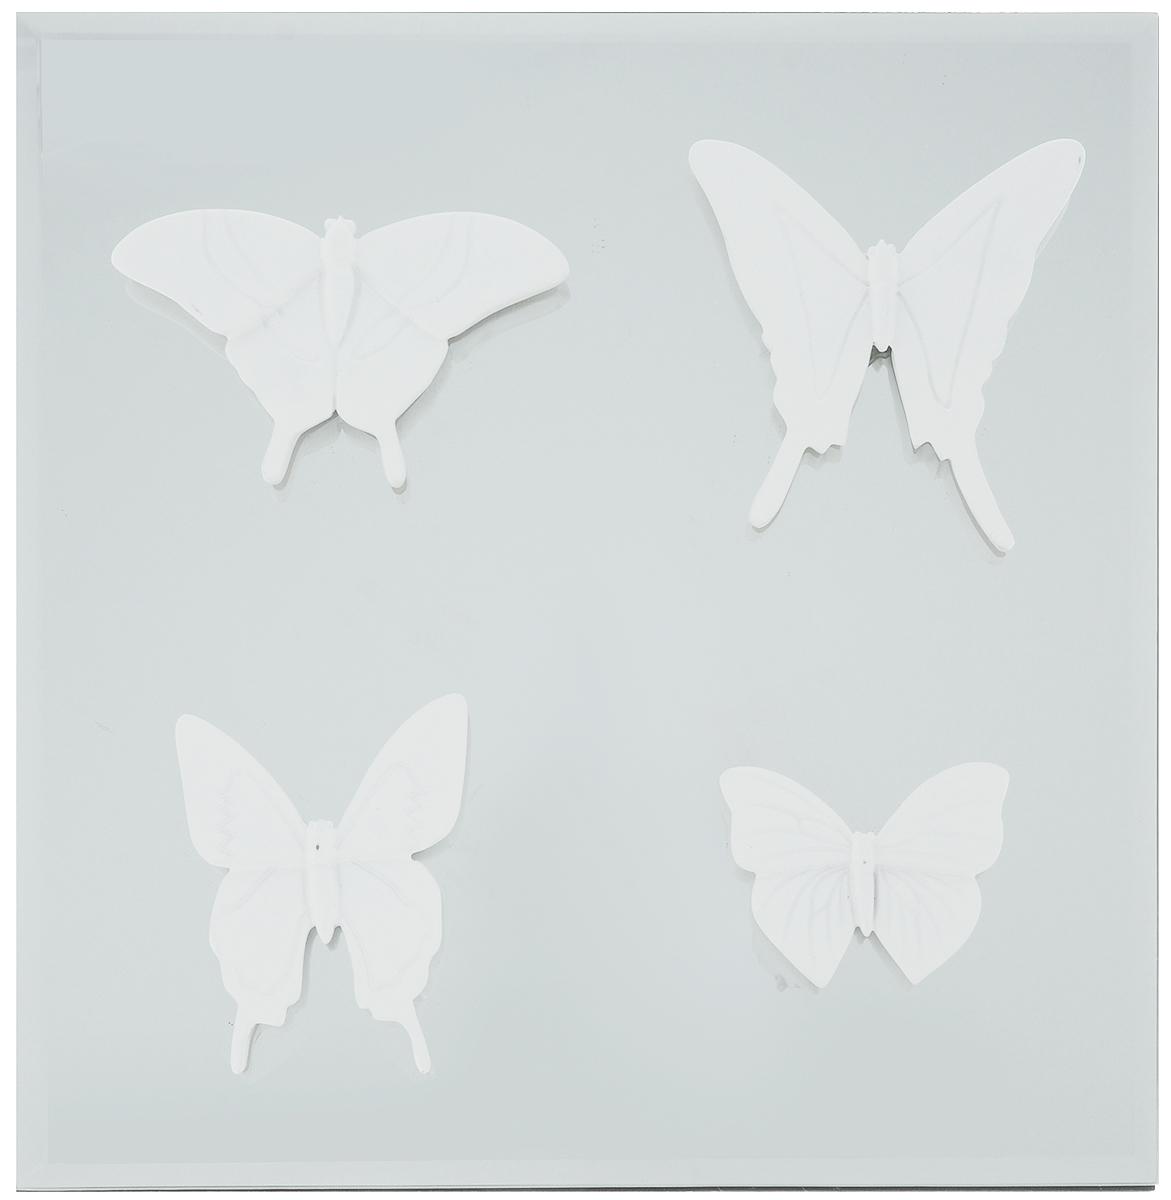 Украшение декоративное Феникс-Презент Бабочки, настенное, 30 x 30 x 3 см набор настольных игр феникс презент 29 14 5 3 2см в деревян коробке 35702